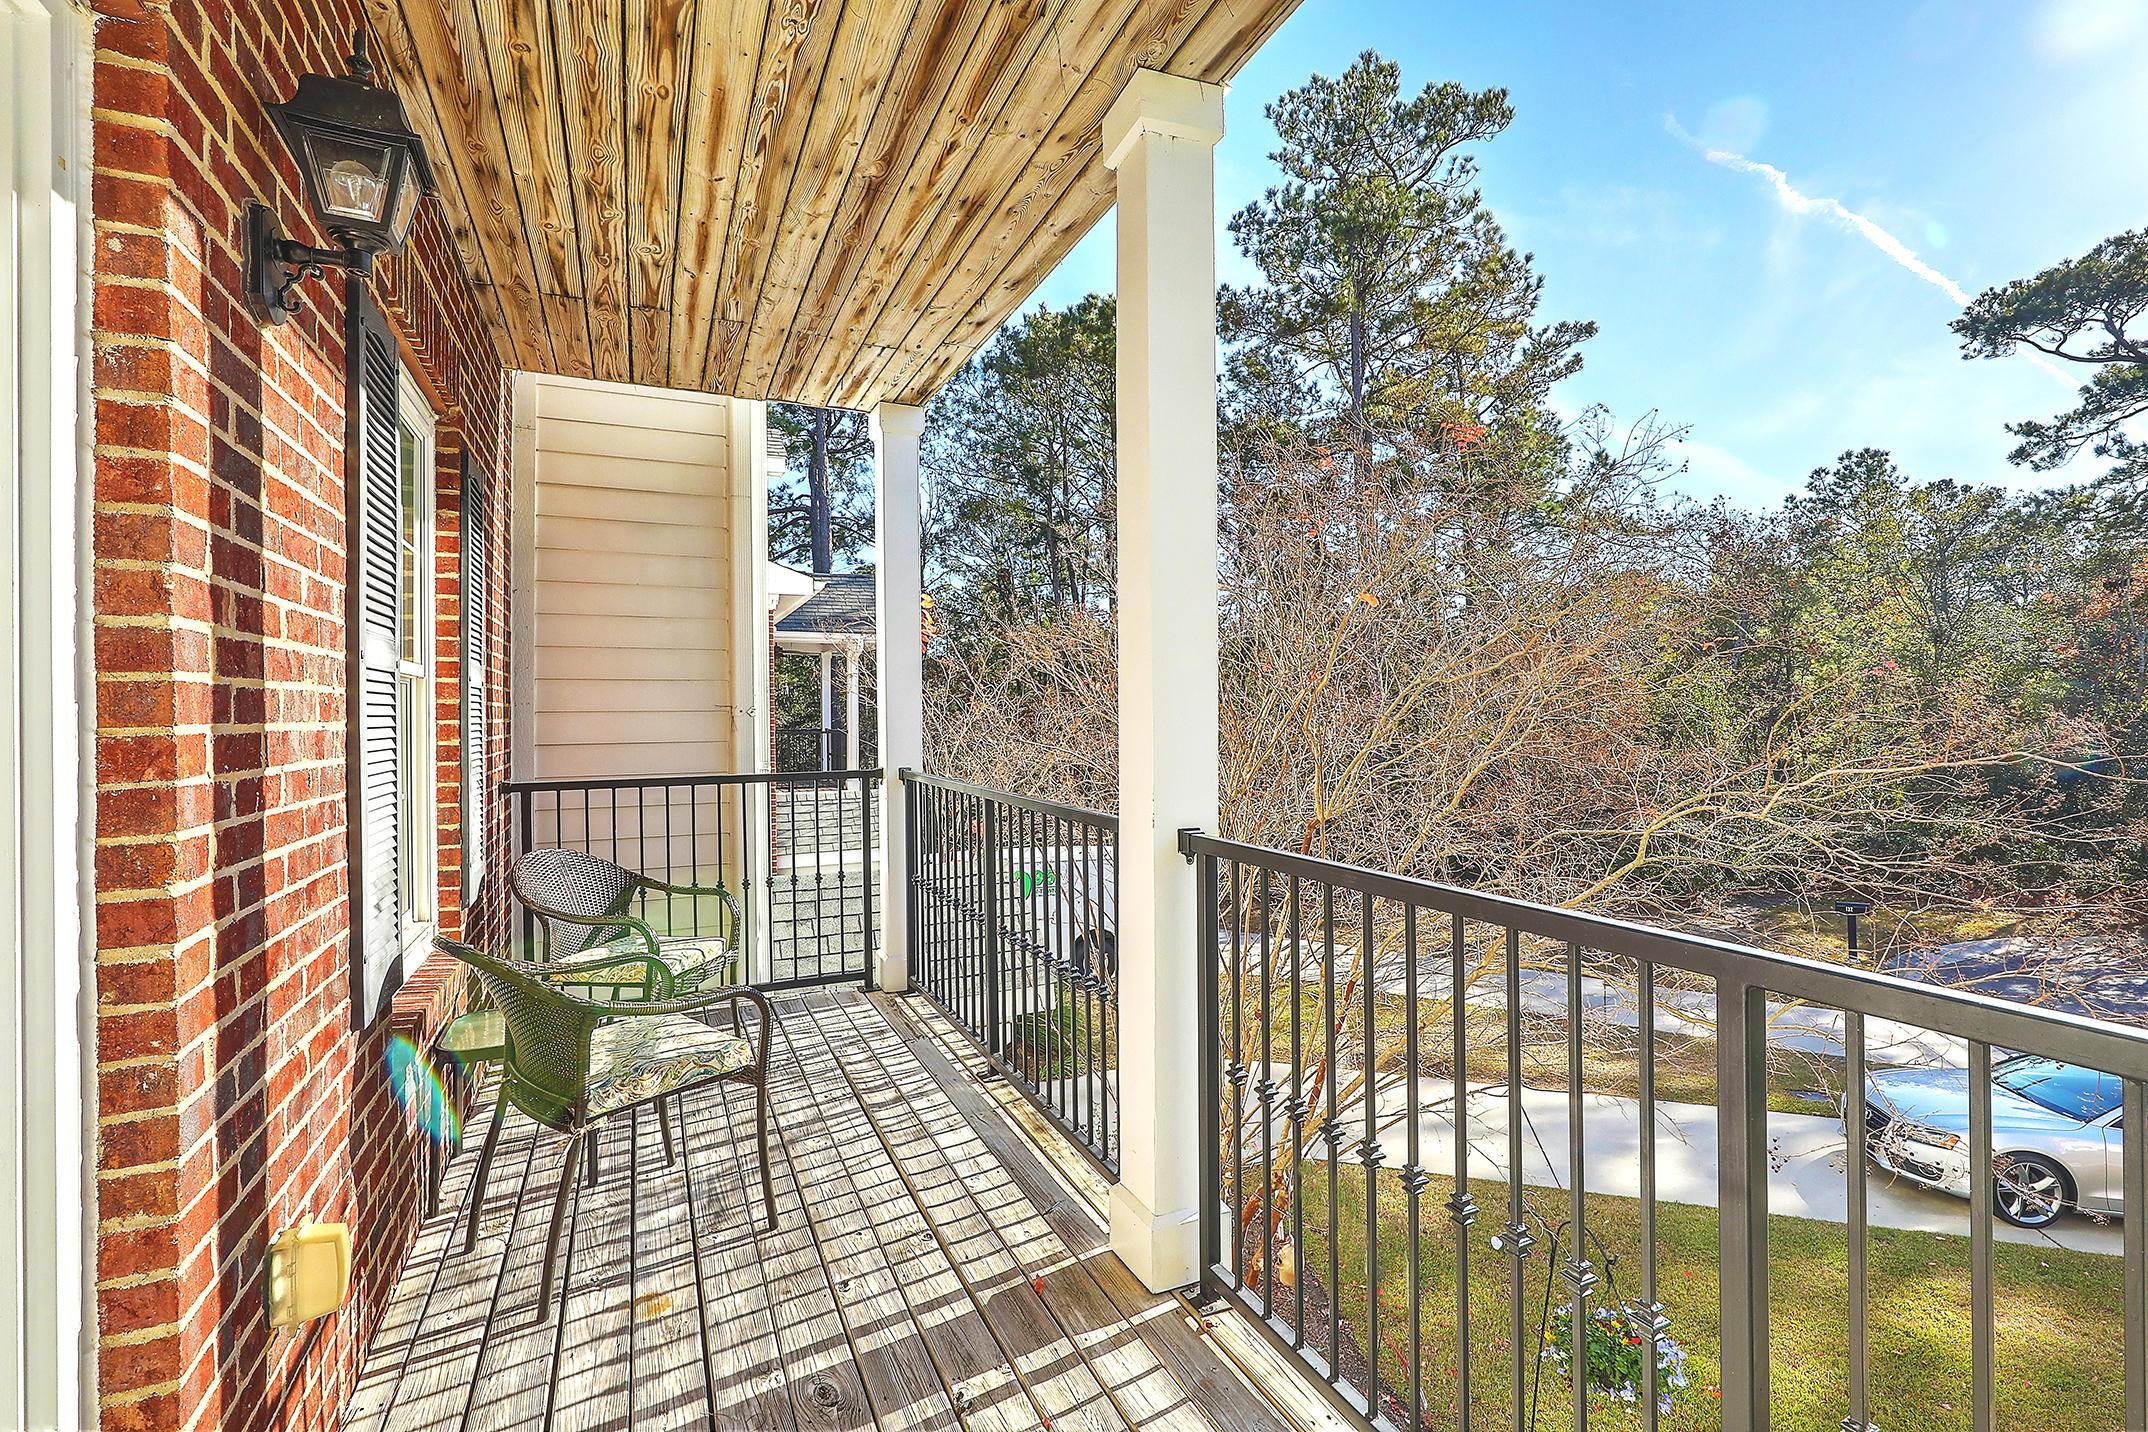 Etiwan Pointe Homes For Sale - 124 Winding Creek, Mount Pleasant, SC - 19